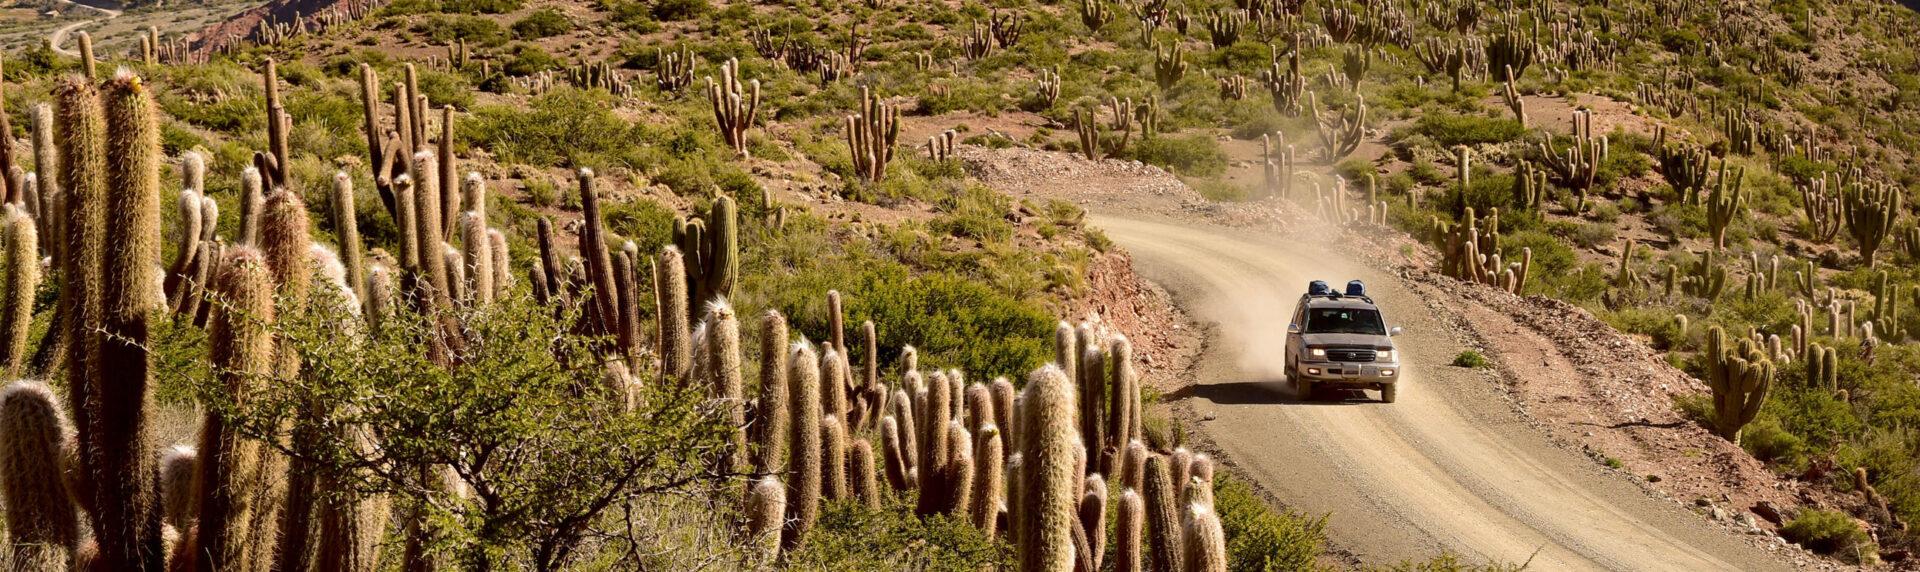 Bolivie Cordillera Lipez Uyuni3